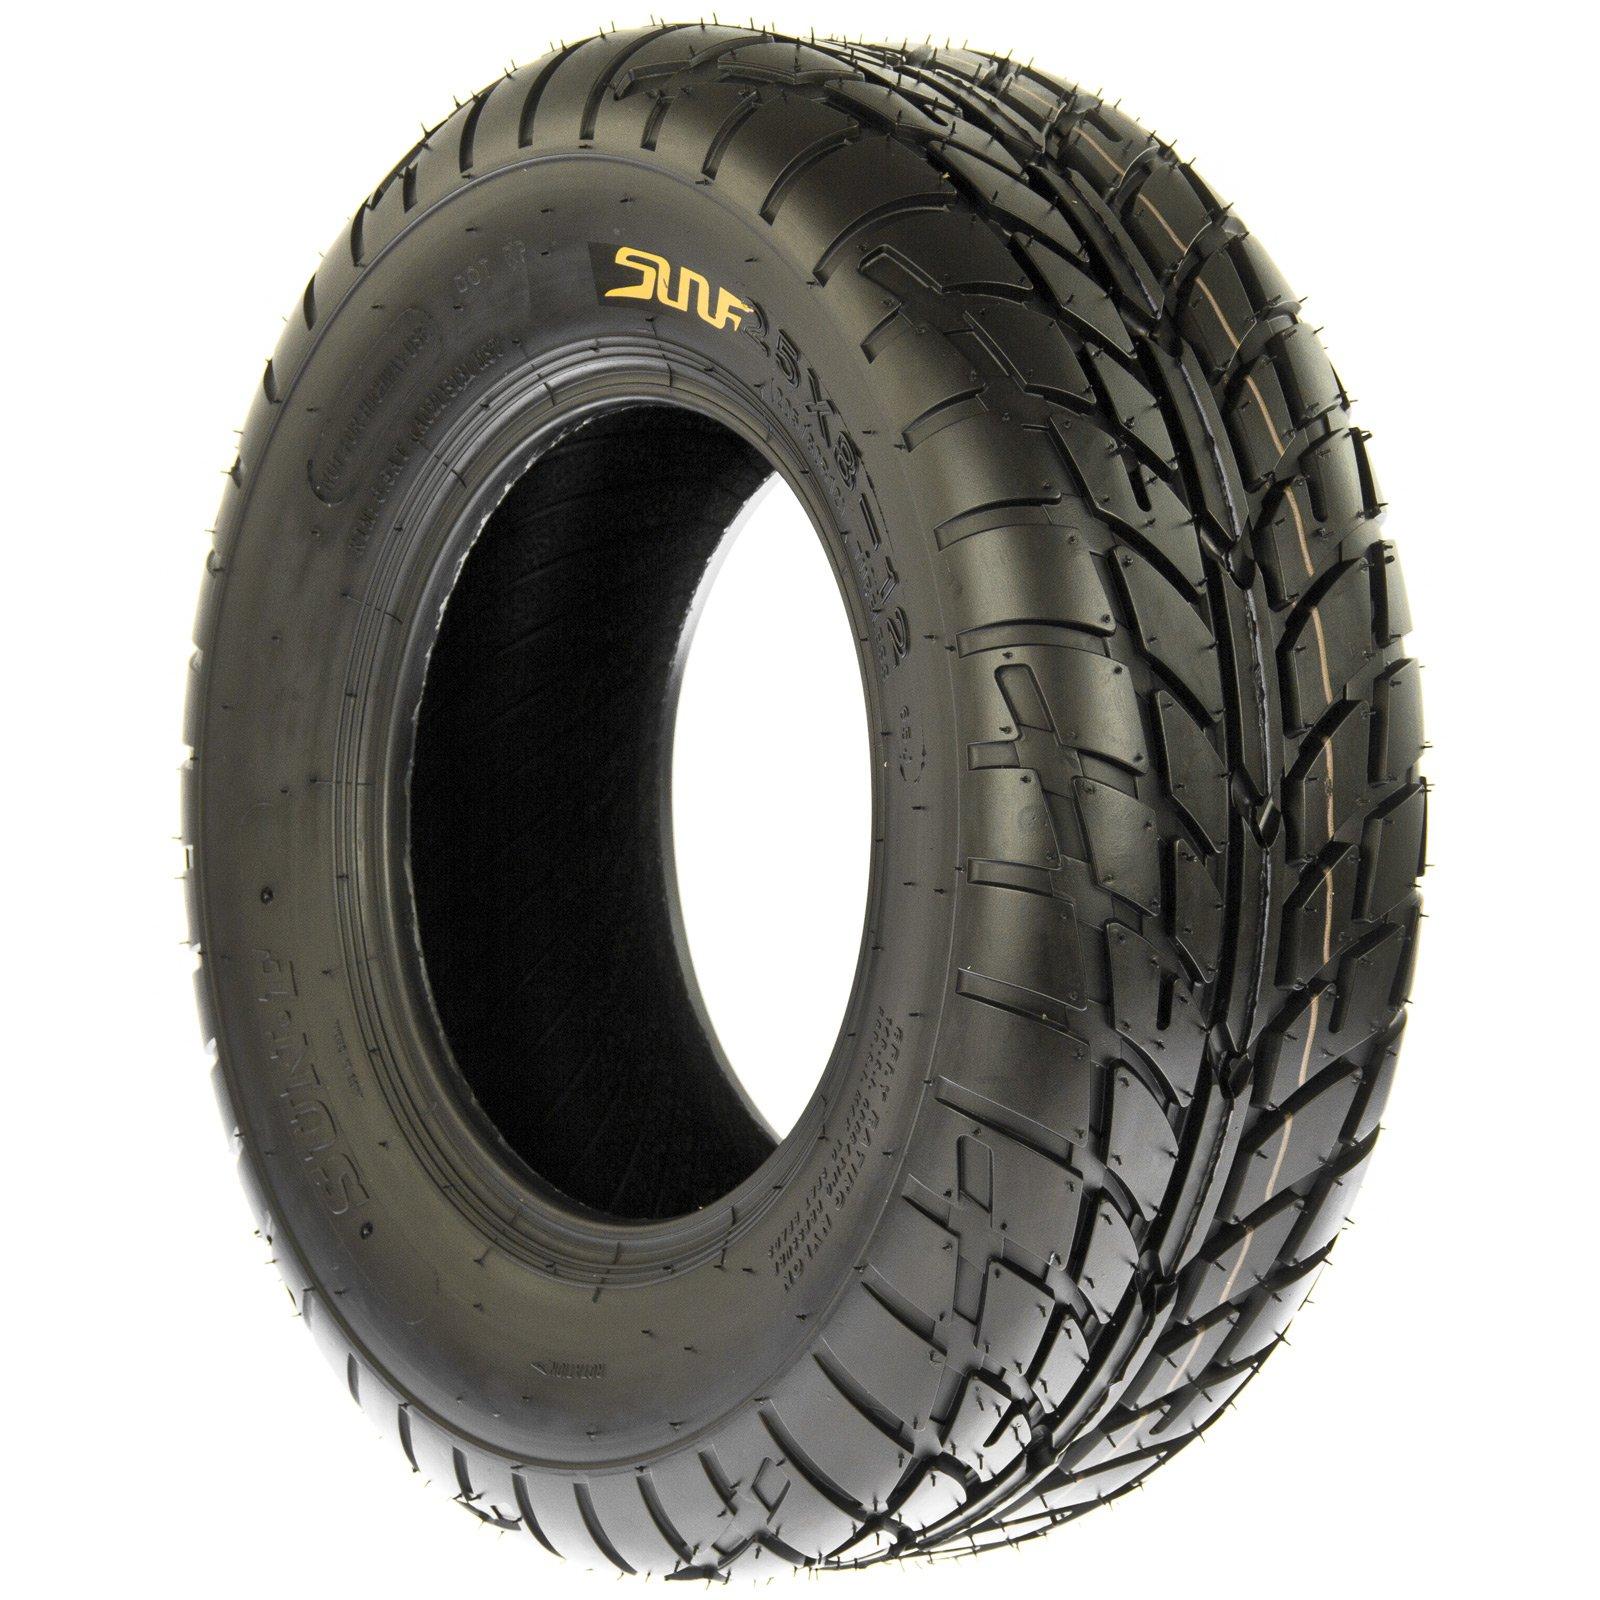 SunF Quad ATV Road Race Tires 225/45-10 225 45 10 4 PR A021 (Full set of 4) by SunF (Image #2)